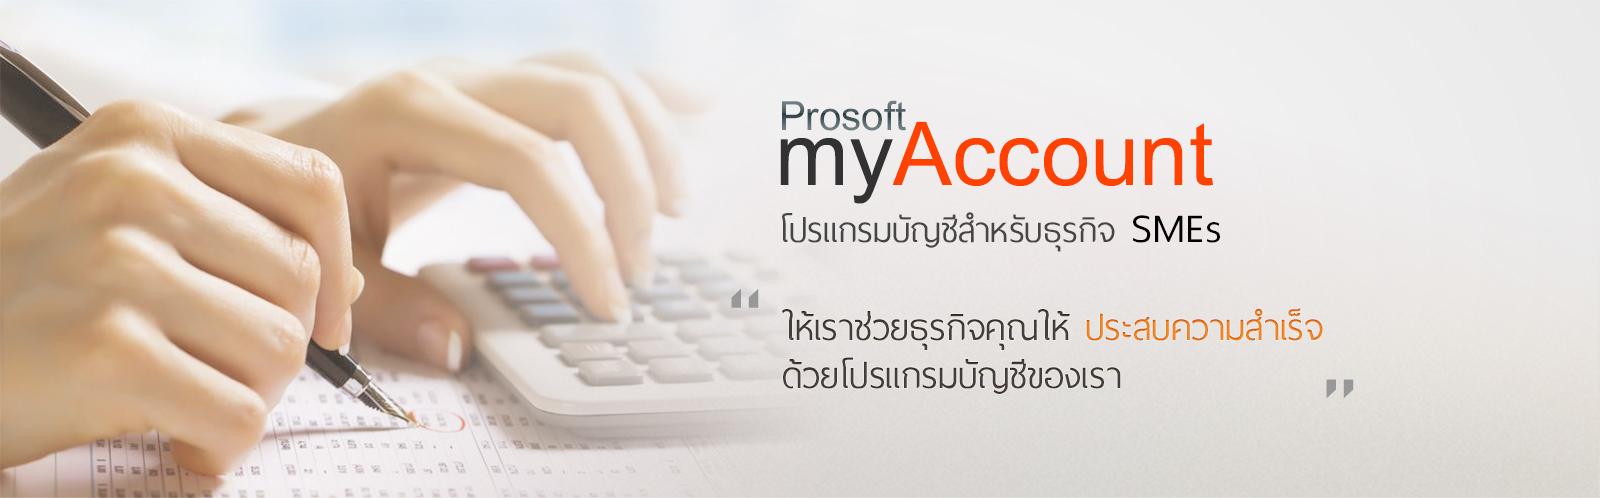 Prosoft myAccount